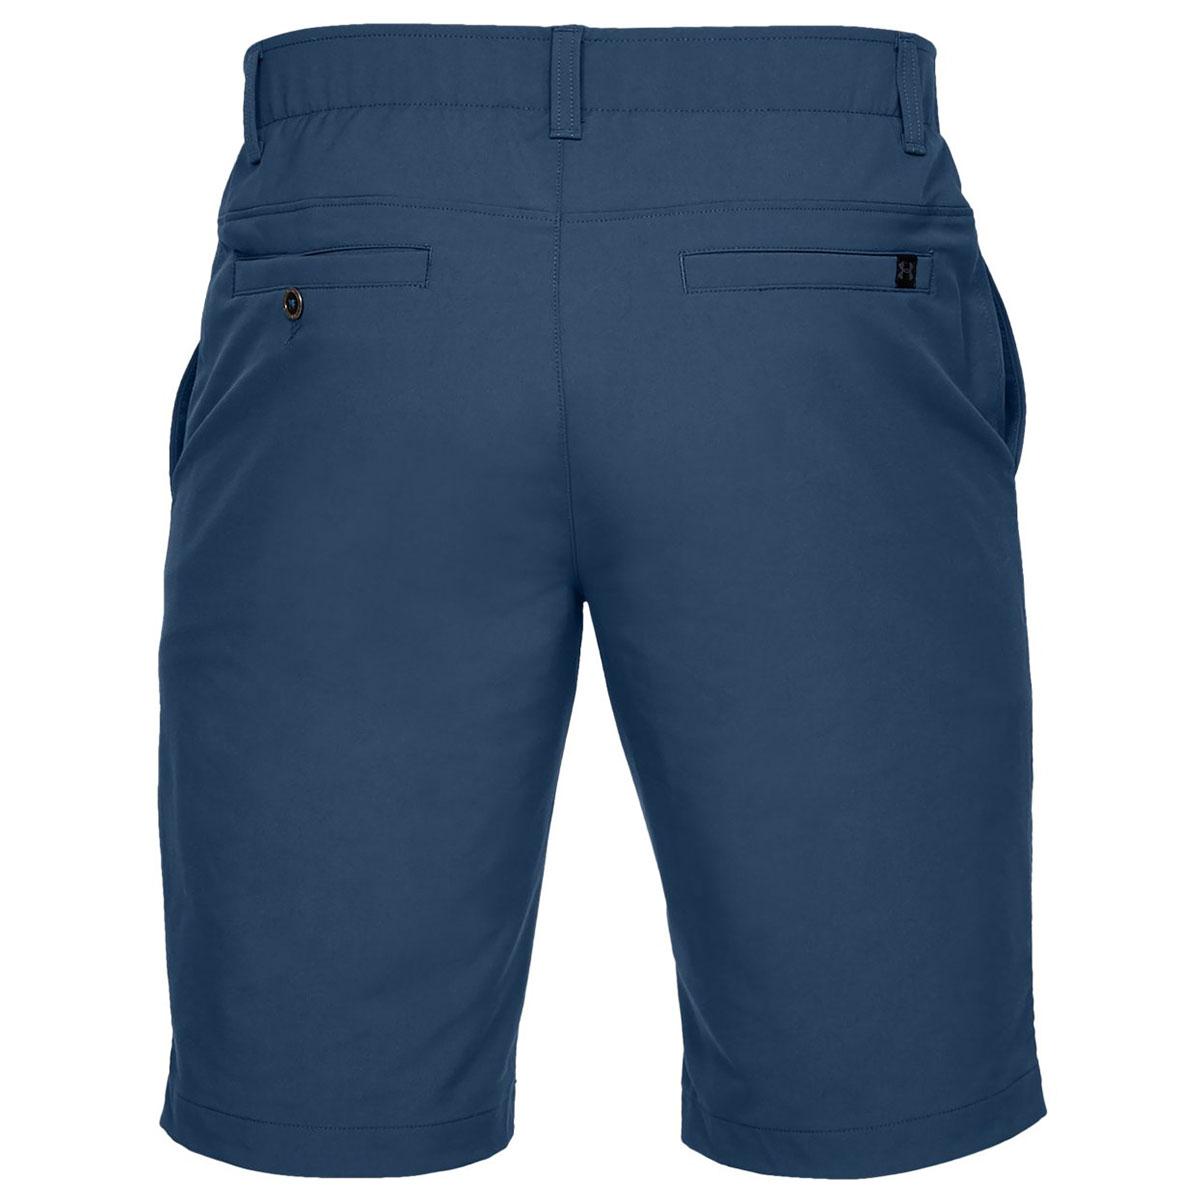 Under-Armour-Mens-2019-EU-Performance-Taper-Stretch-Soft-Comfort-Golf-Shorts thumbnail 9